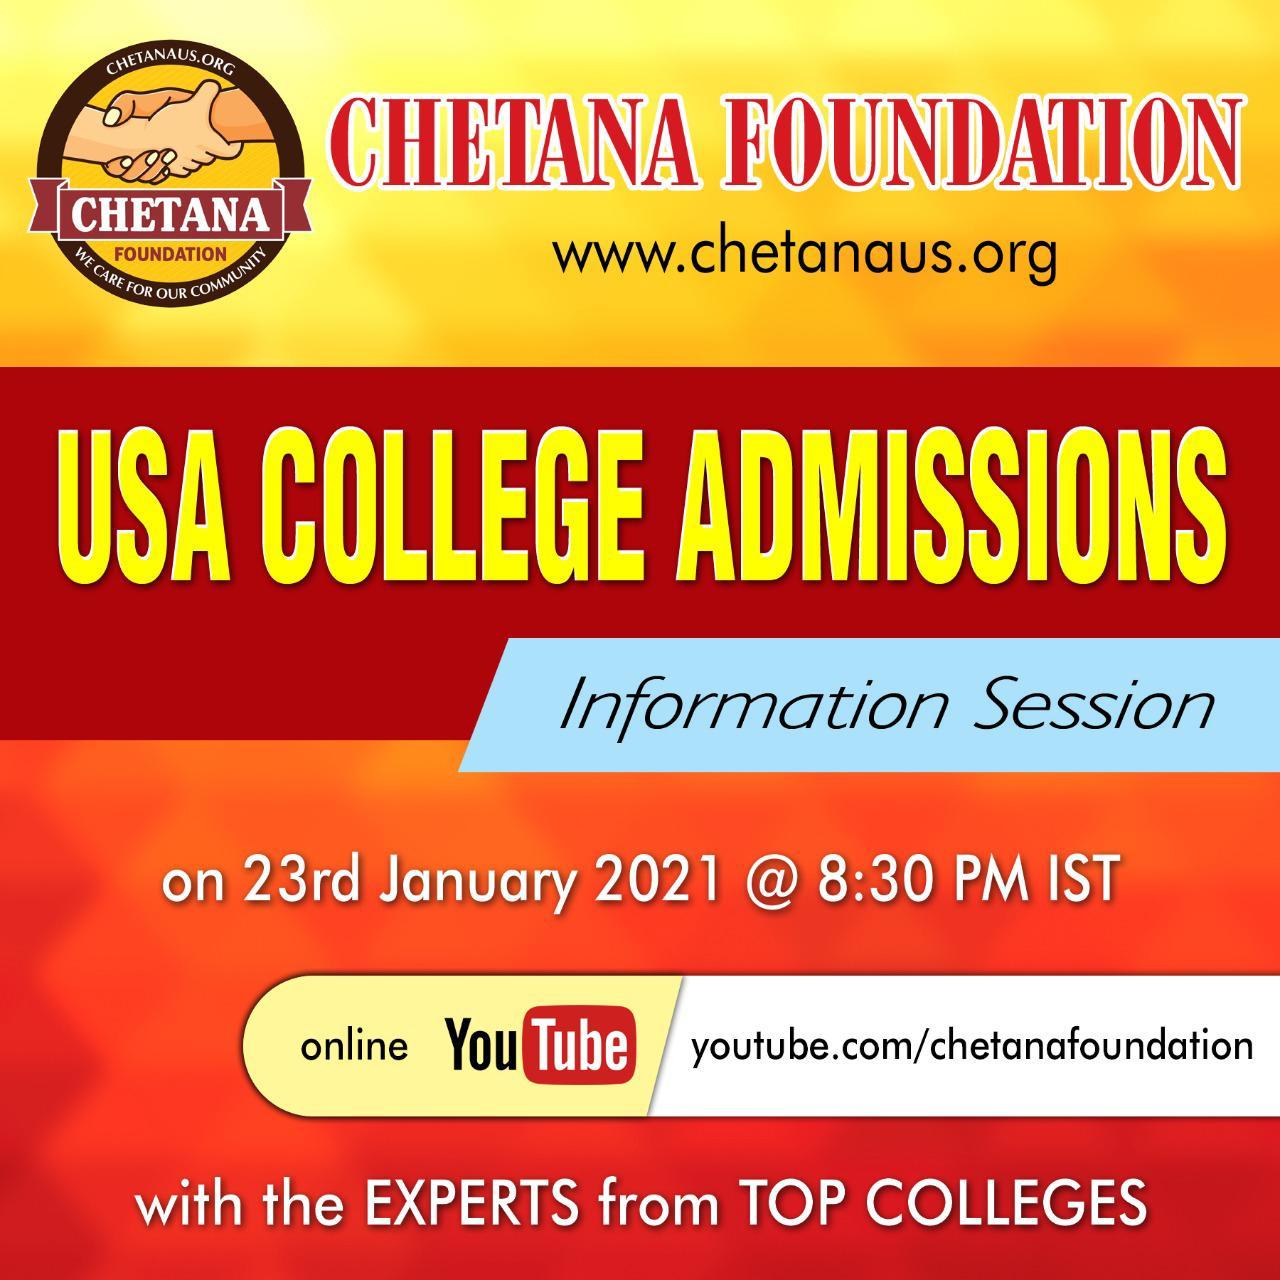 Chetana Foundation – USA College Admissions Information Session